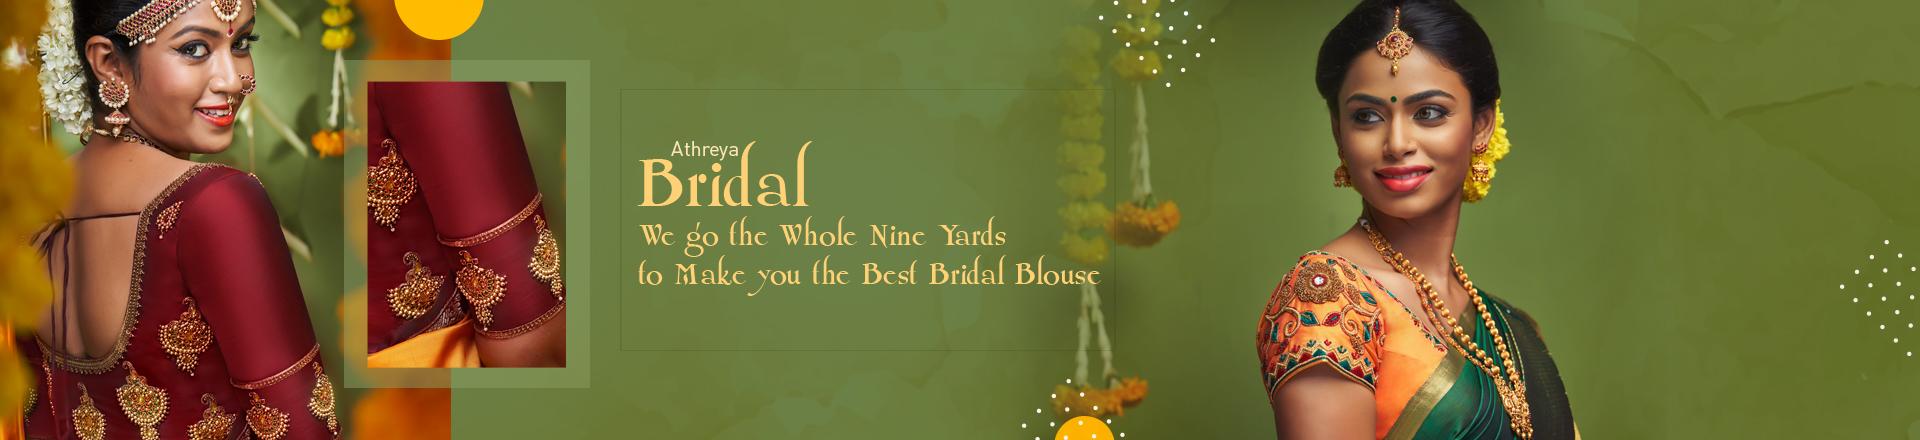 Athreya Bridal